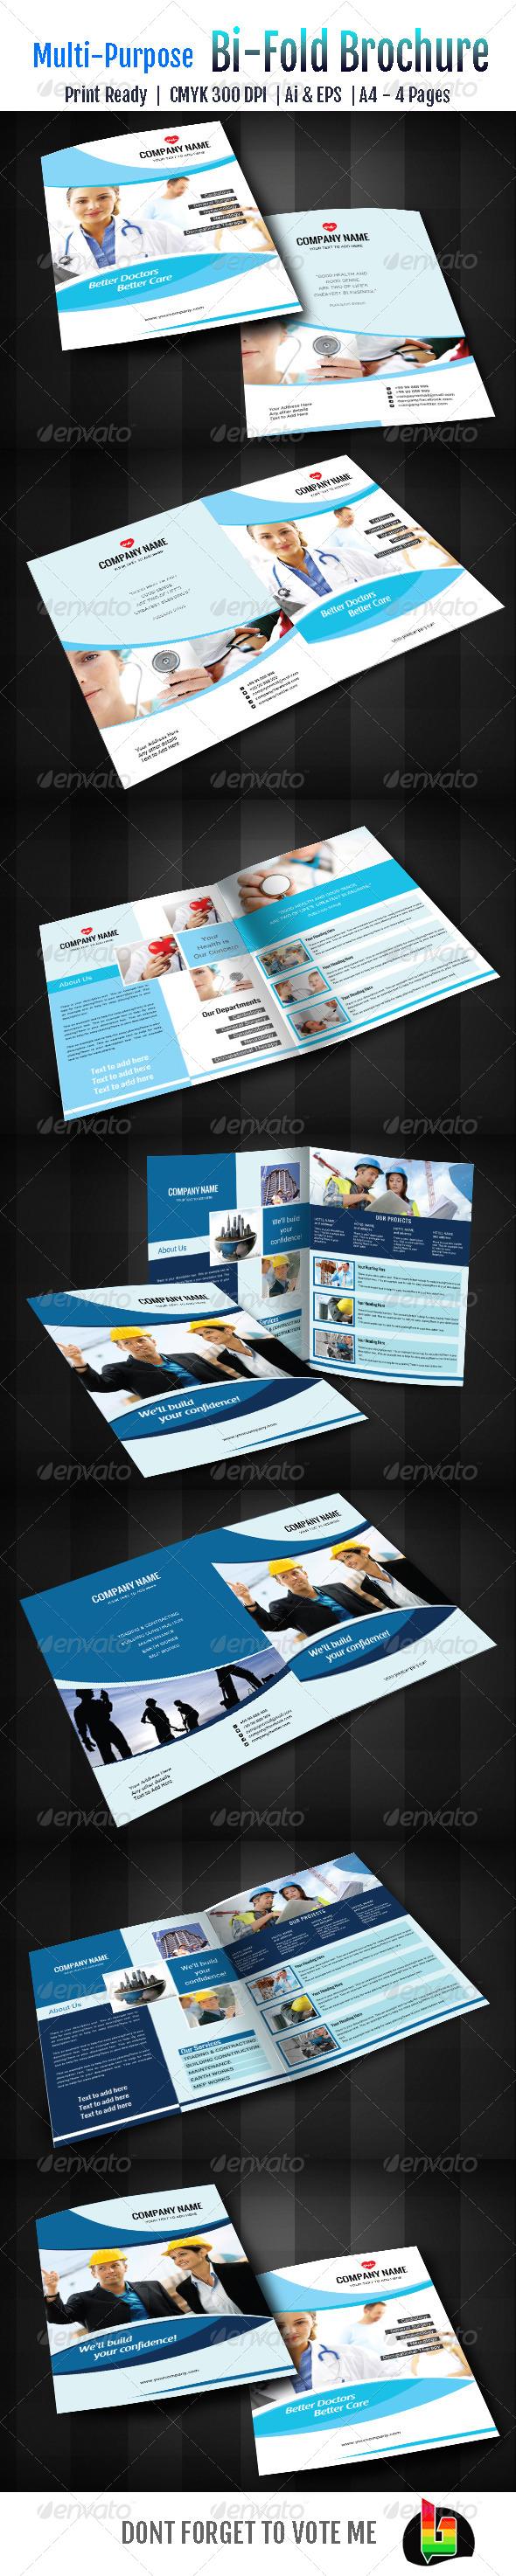 GraphicRiver Multipurpose Bi-Fold Brochure 6837593